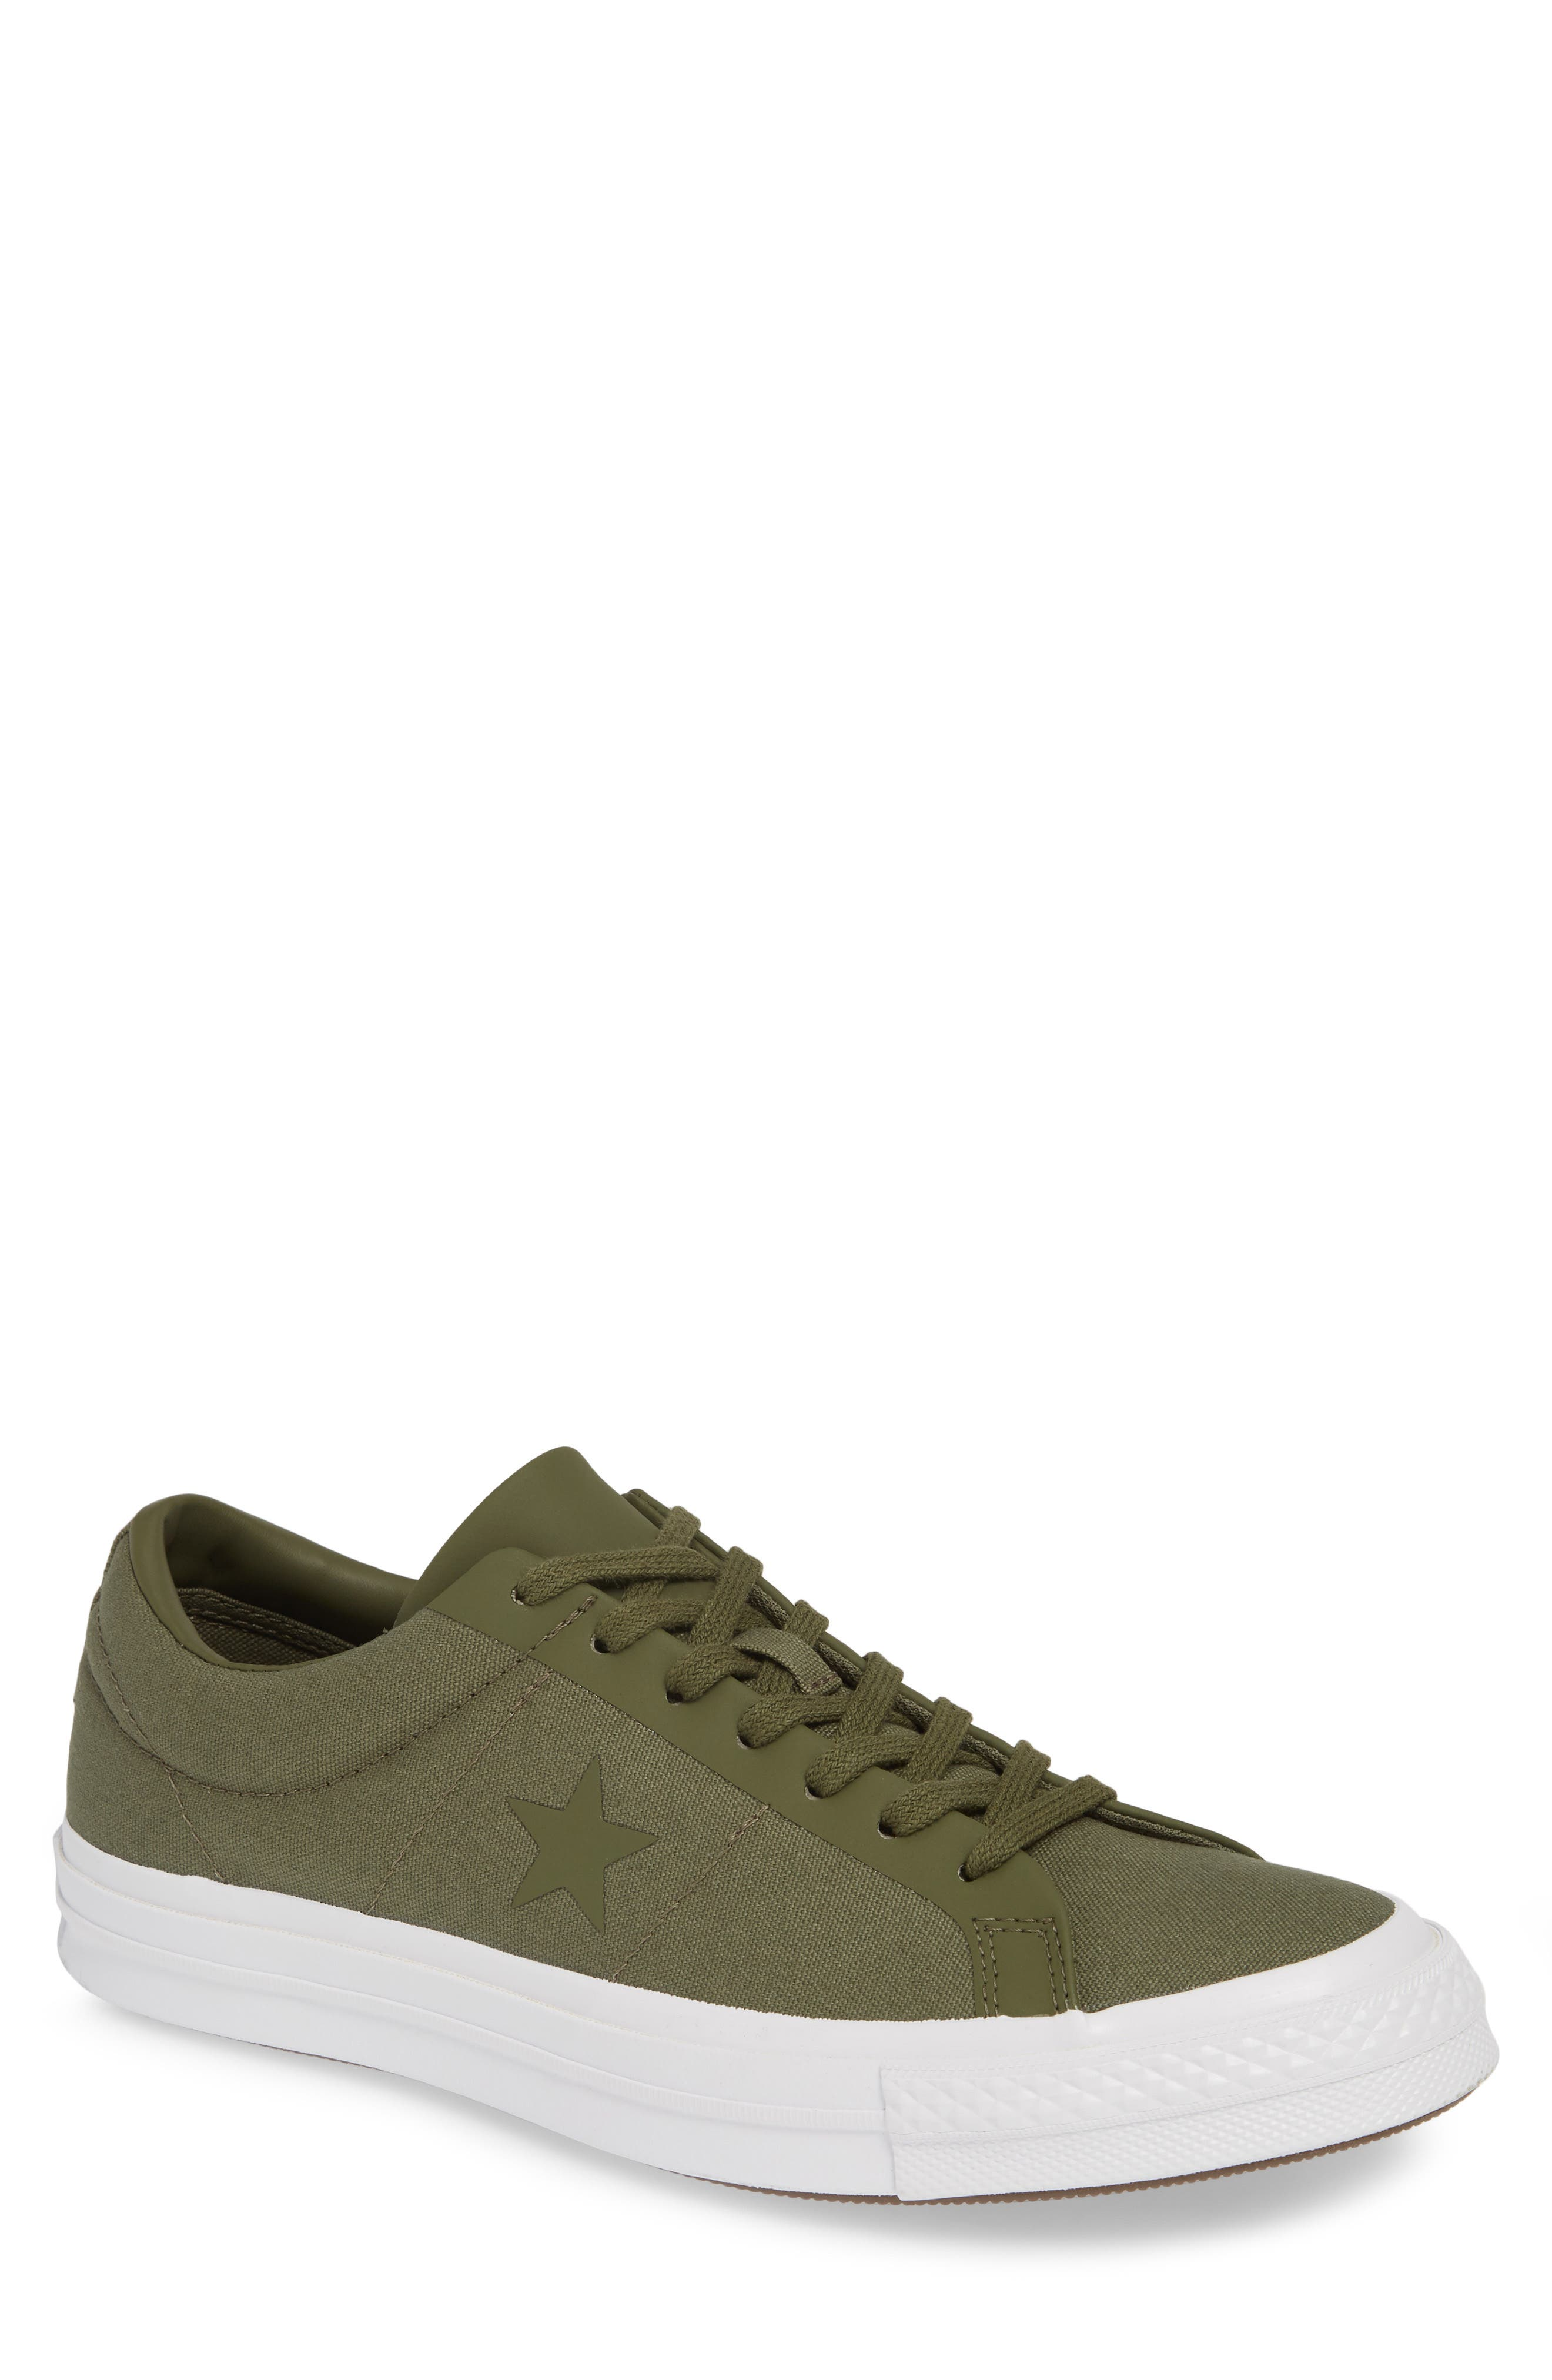 Converse One Star Sneaker, Green